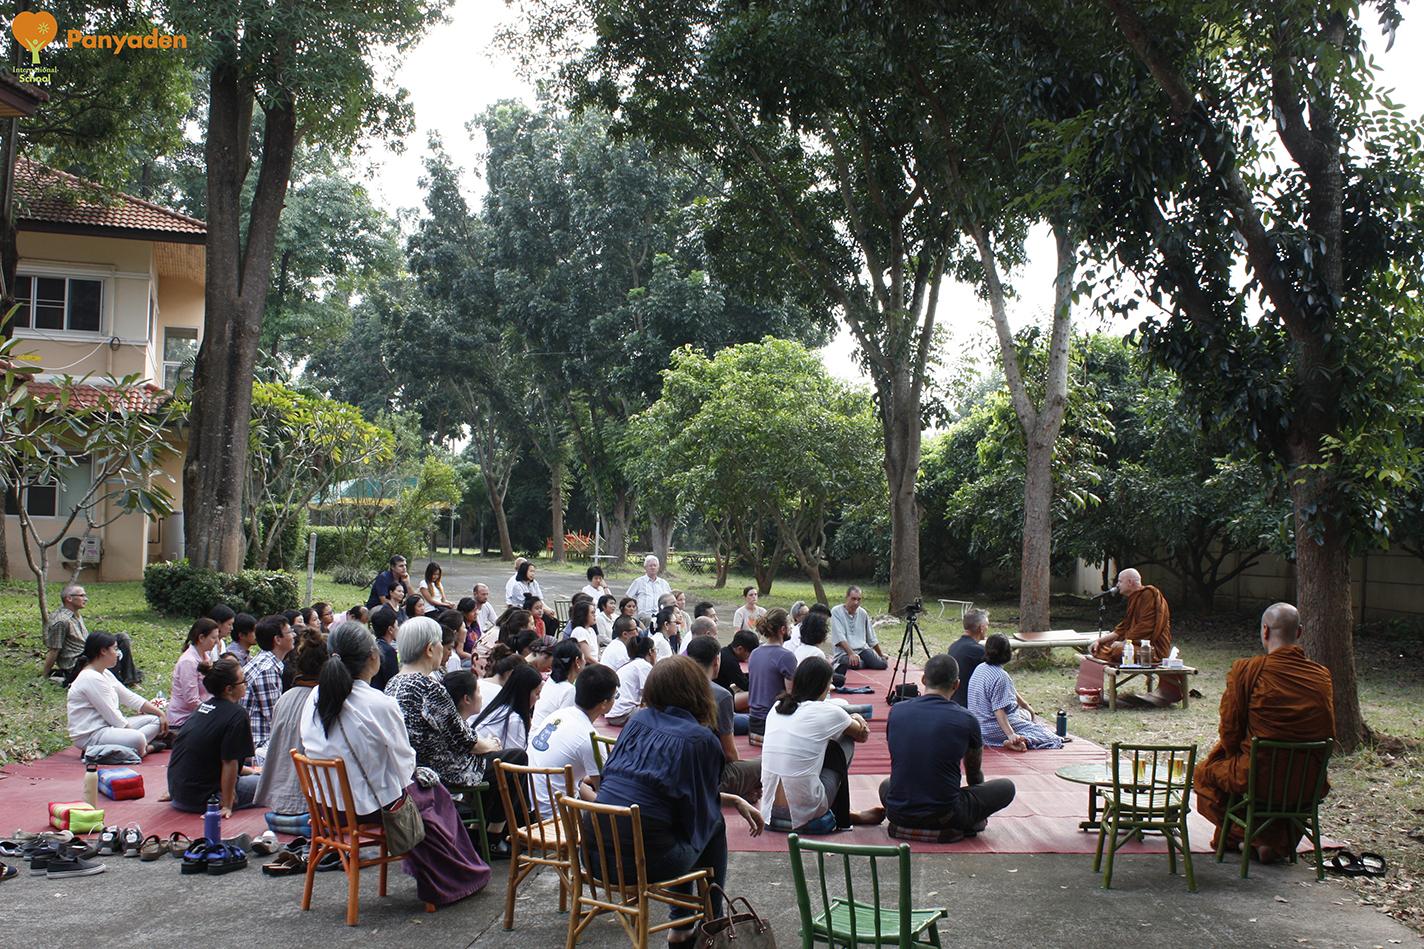 Venerable Ajahn Jayasaro giving a dhamma talk to Panyaden community at the school's temporary site